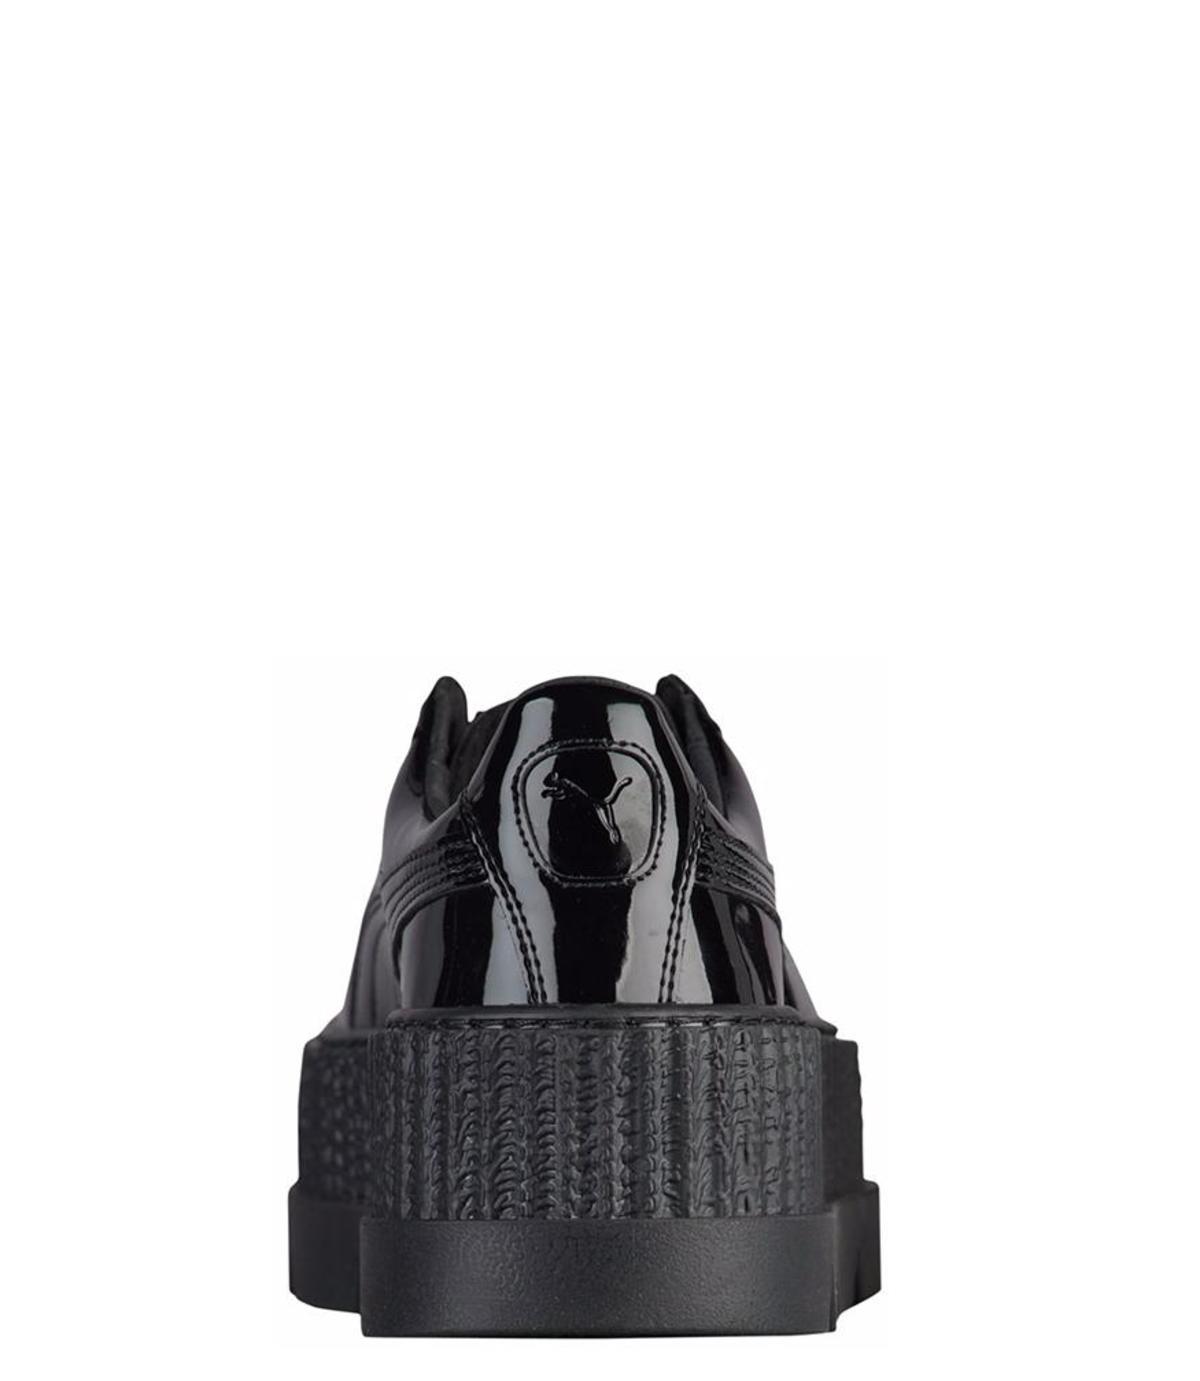 quality design 45227 2dbdd Puma x Rihanna Fenty Pointy Creeper Patent - Black